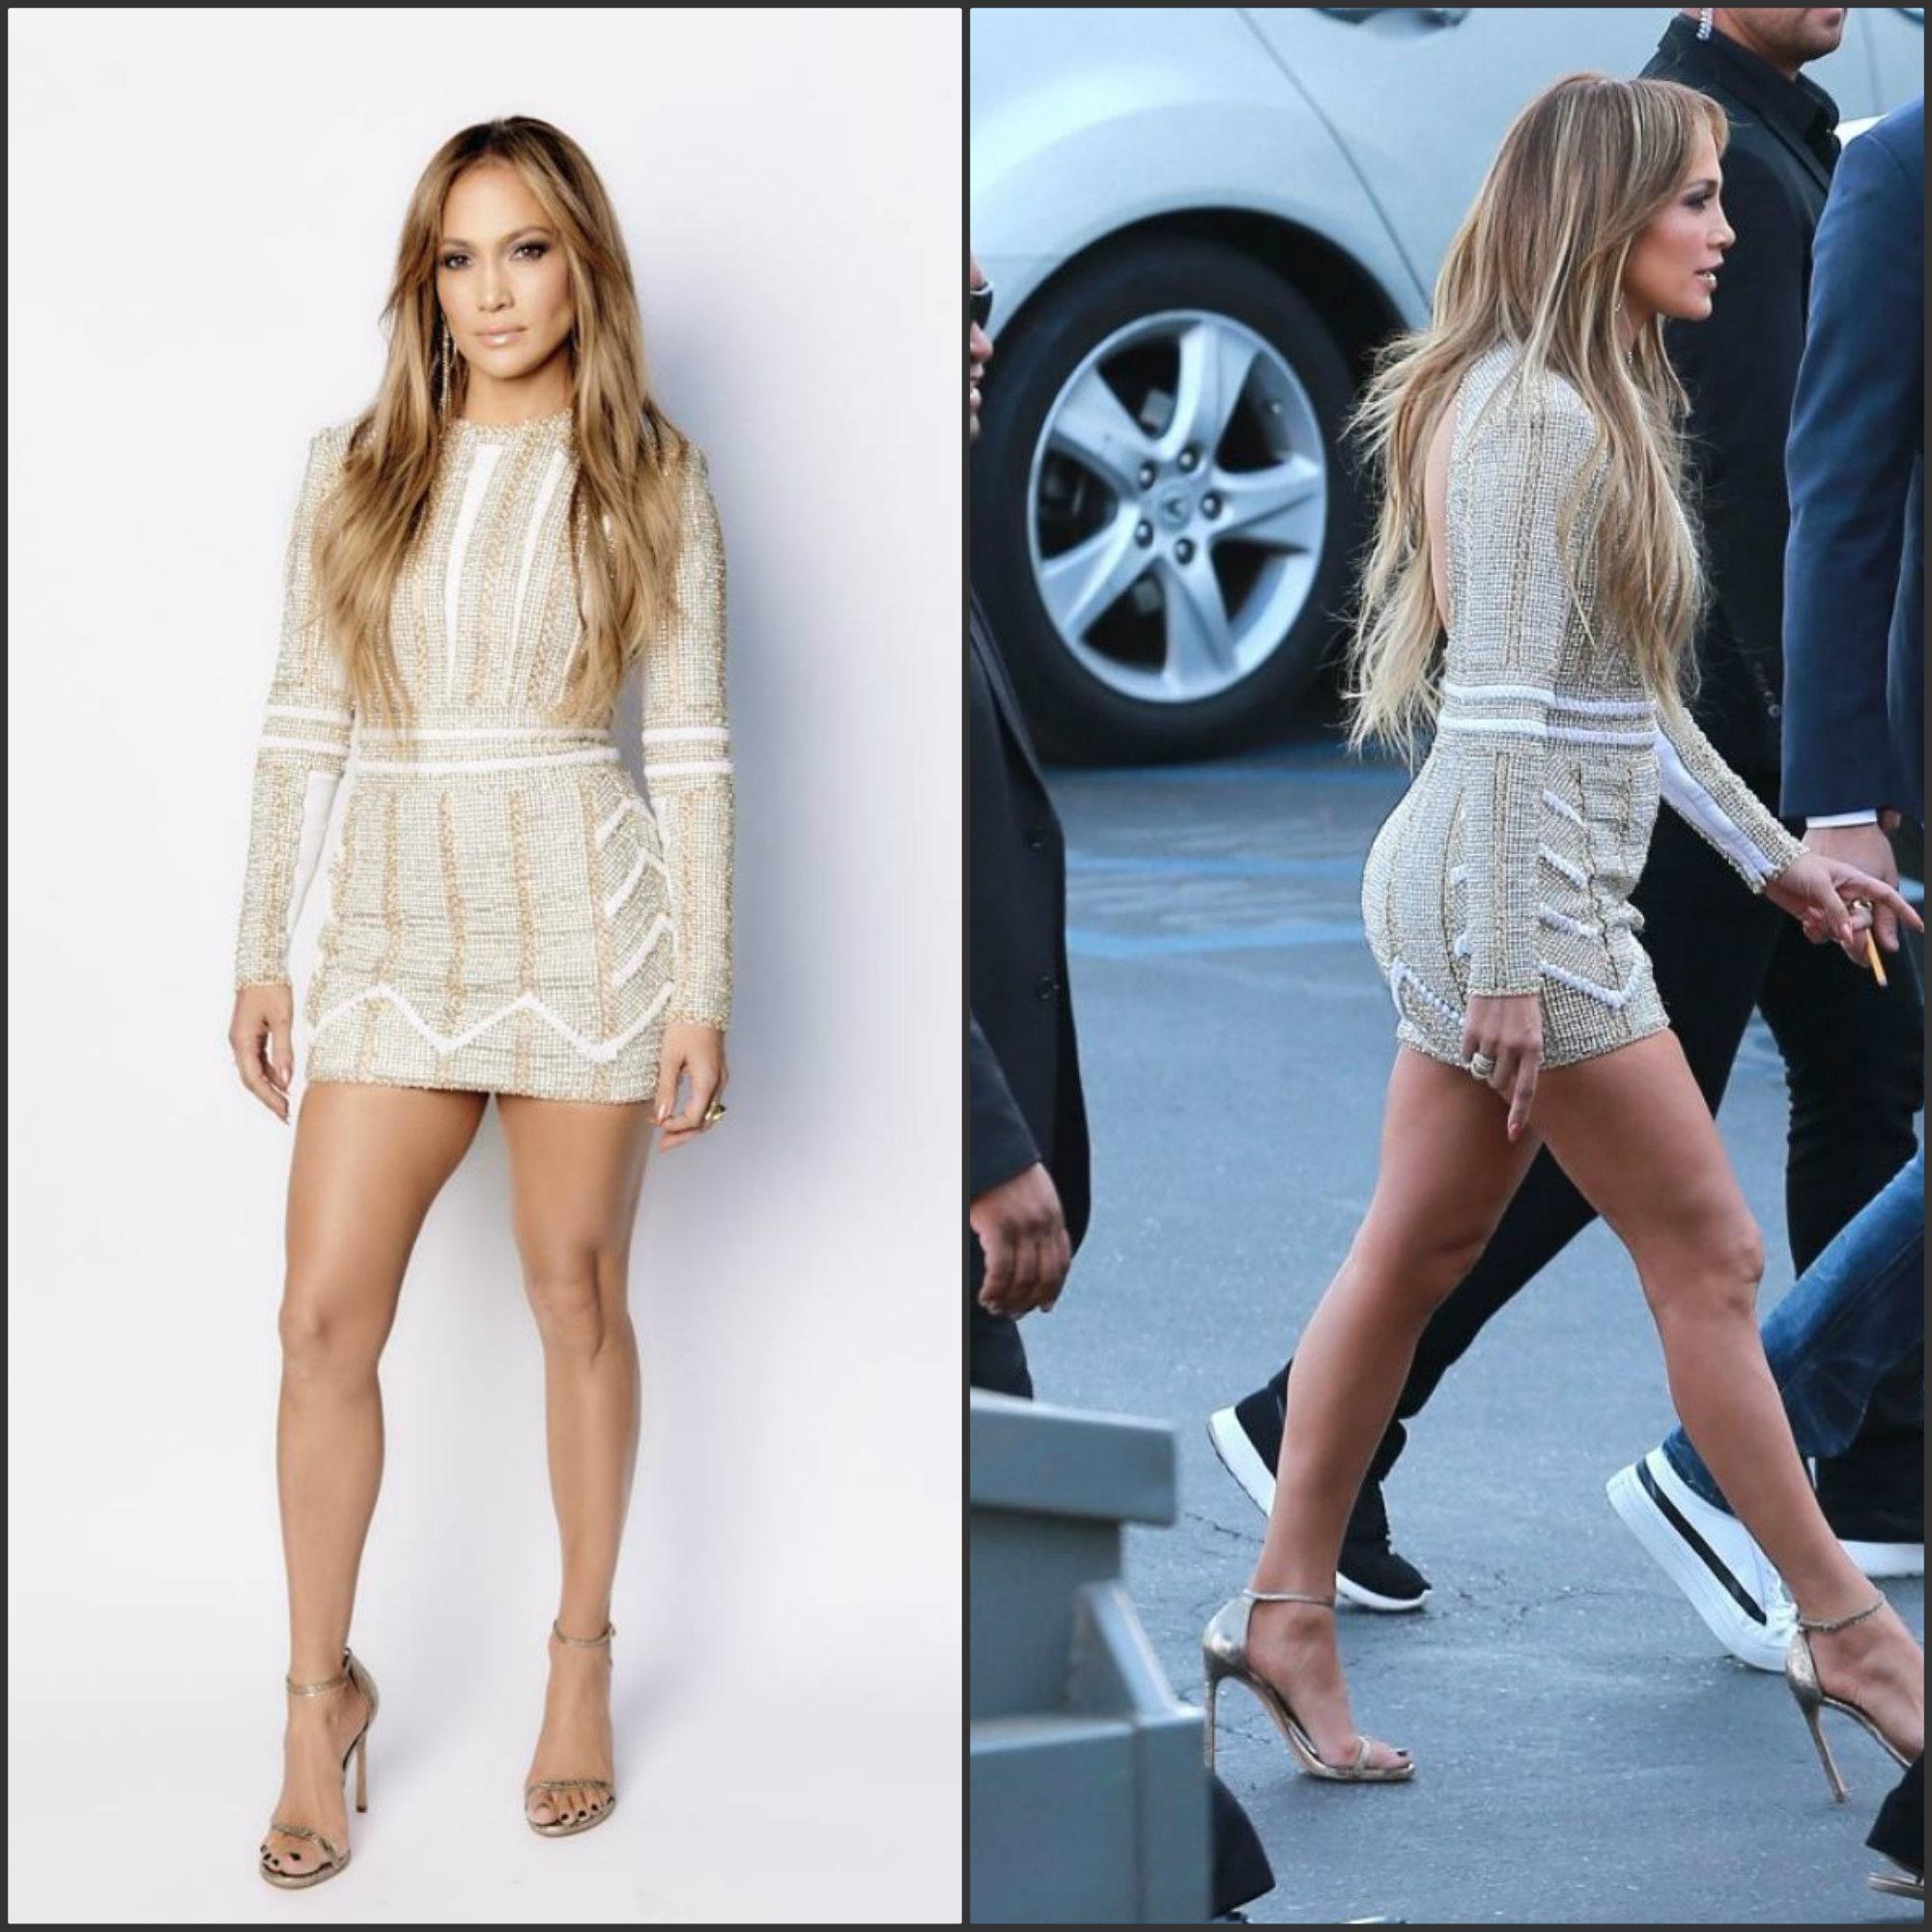 Jennifer-Lopez-in-Nicolas-Jebran-on-American-Idol-Season-XIV-Show